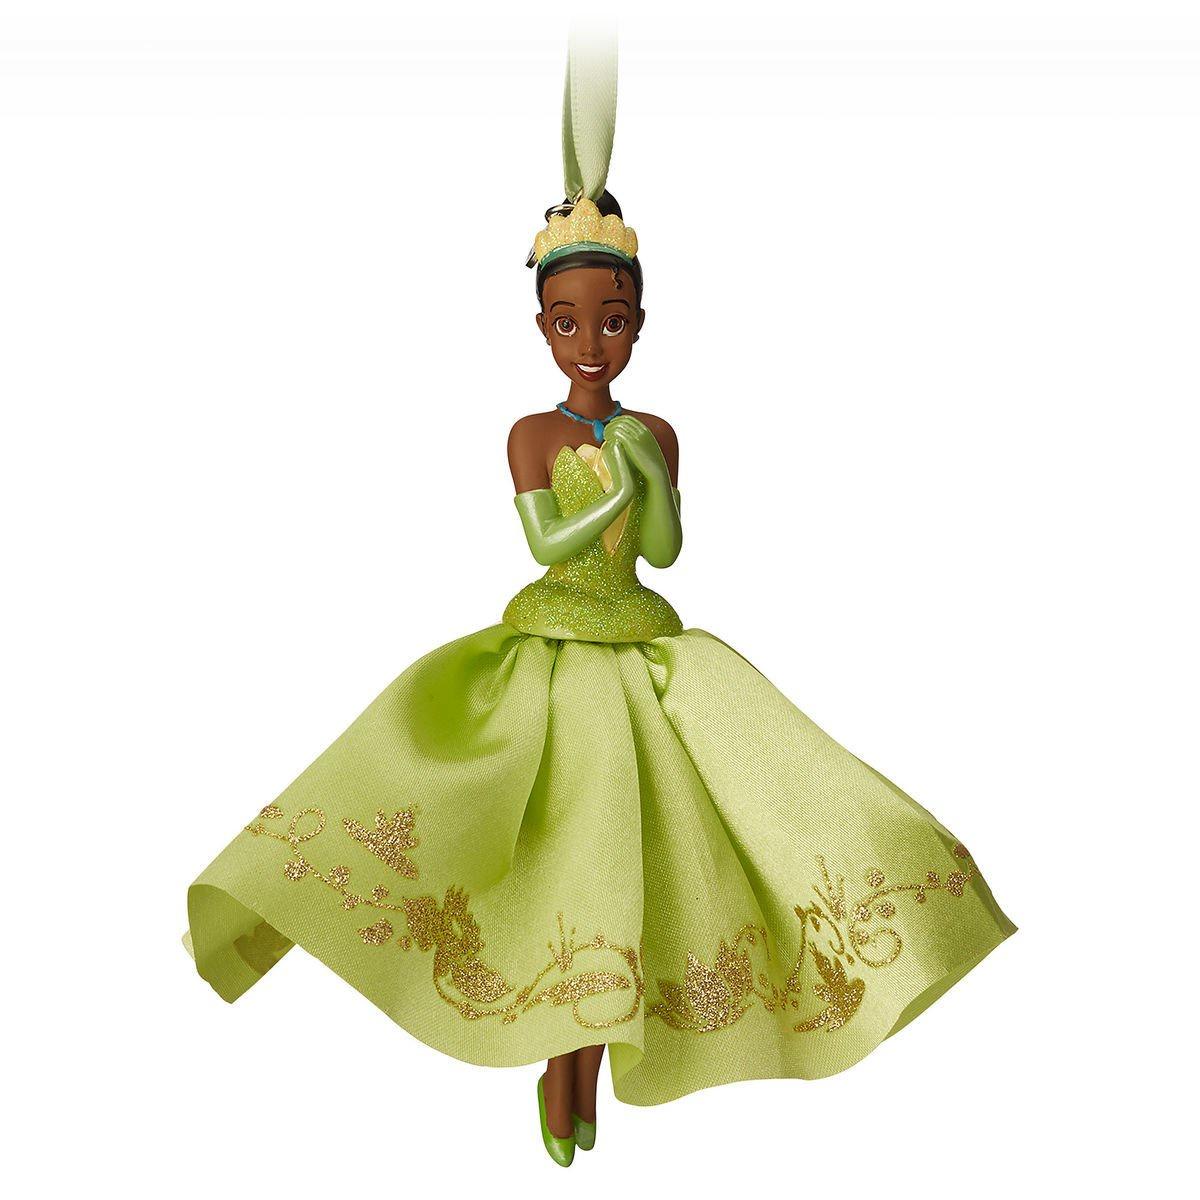 Елочная игрушка Дисней Тиана принцесса и лягушка